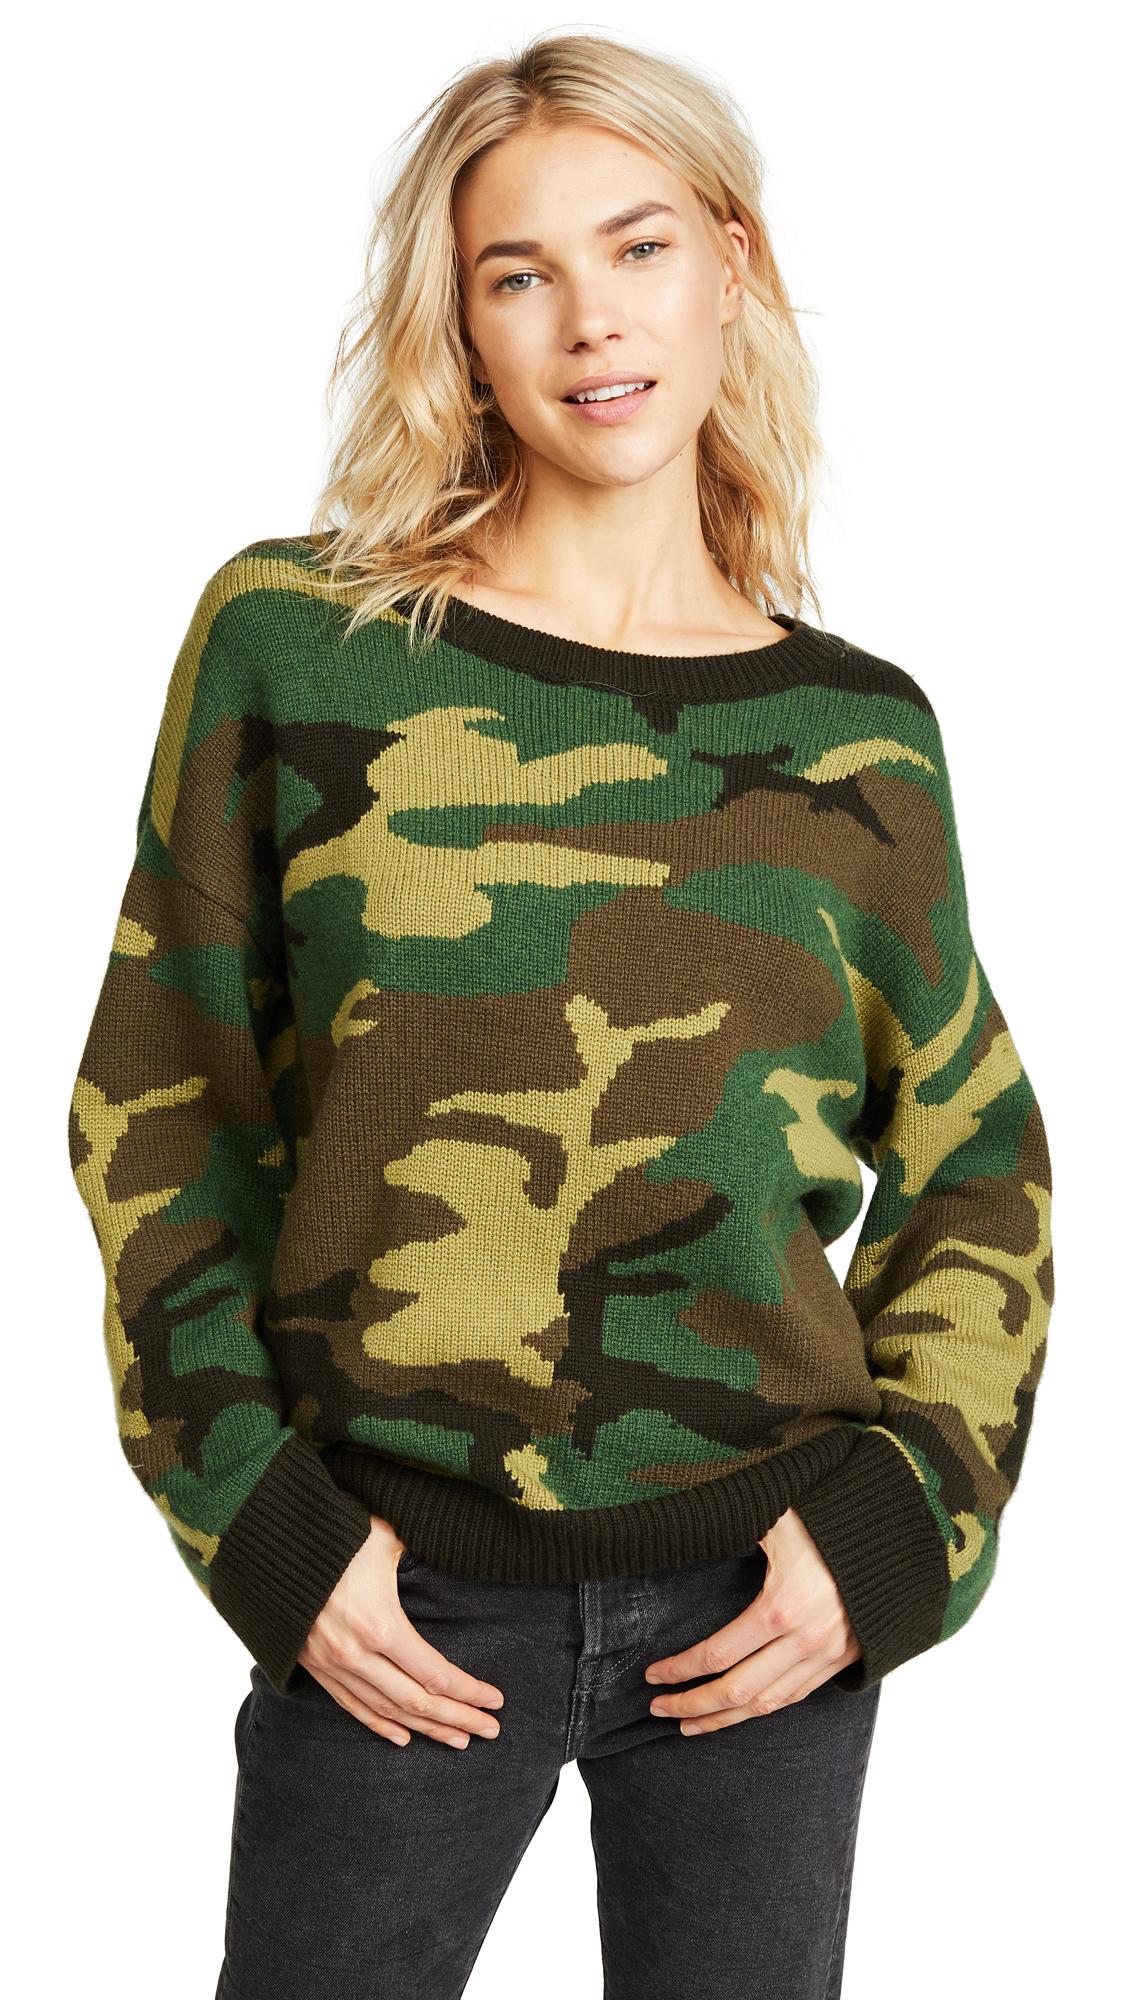 Nili Lotan Moselle Sweater - Camouflage